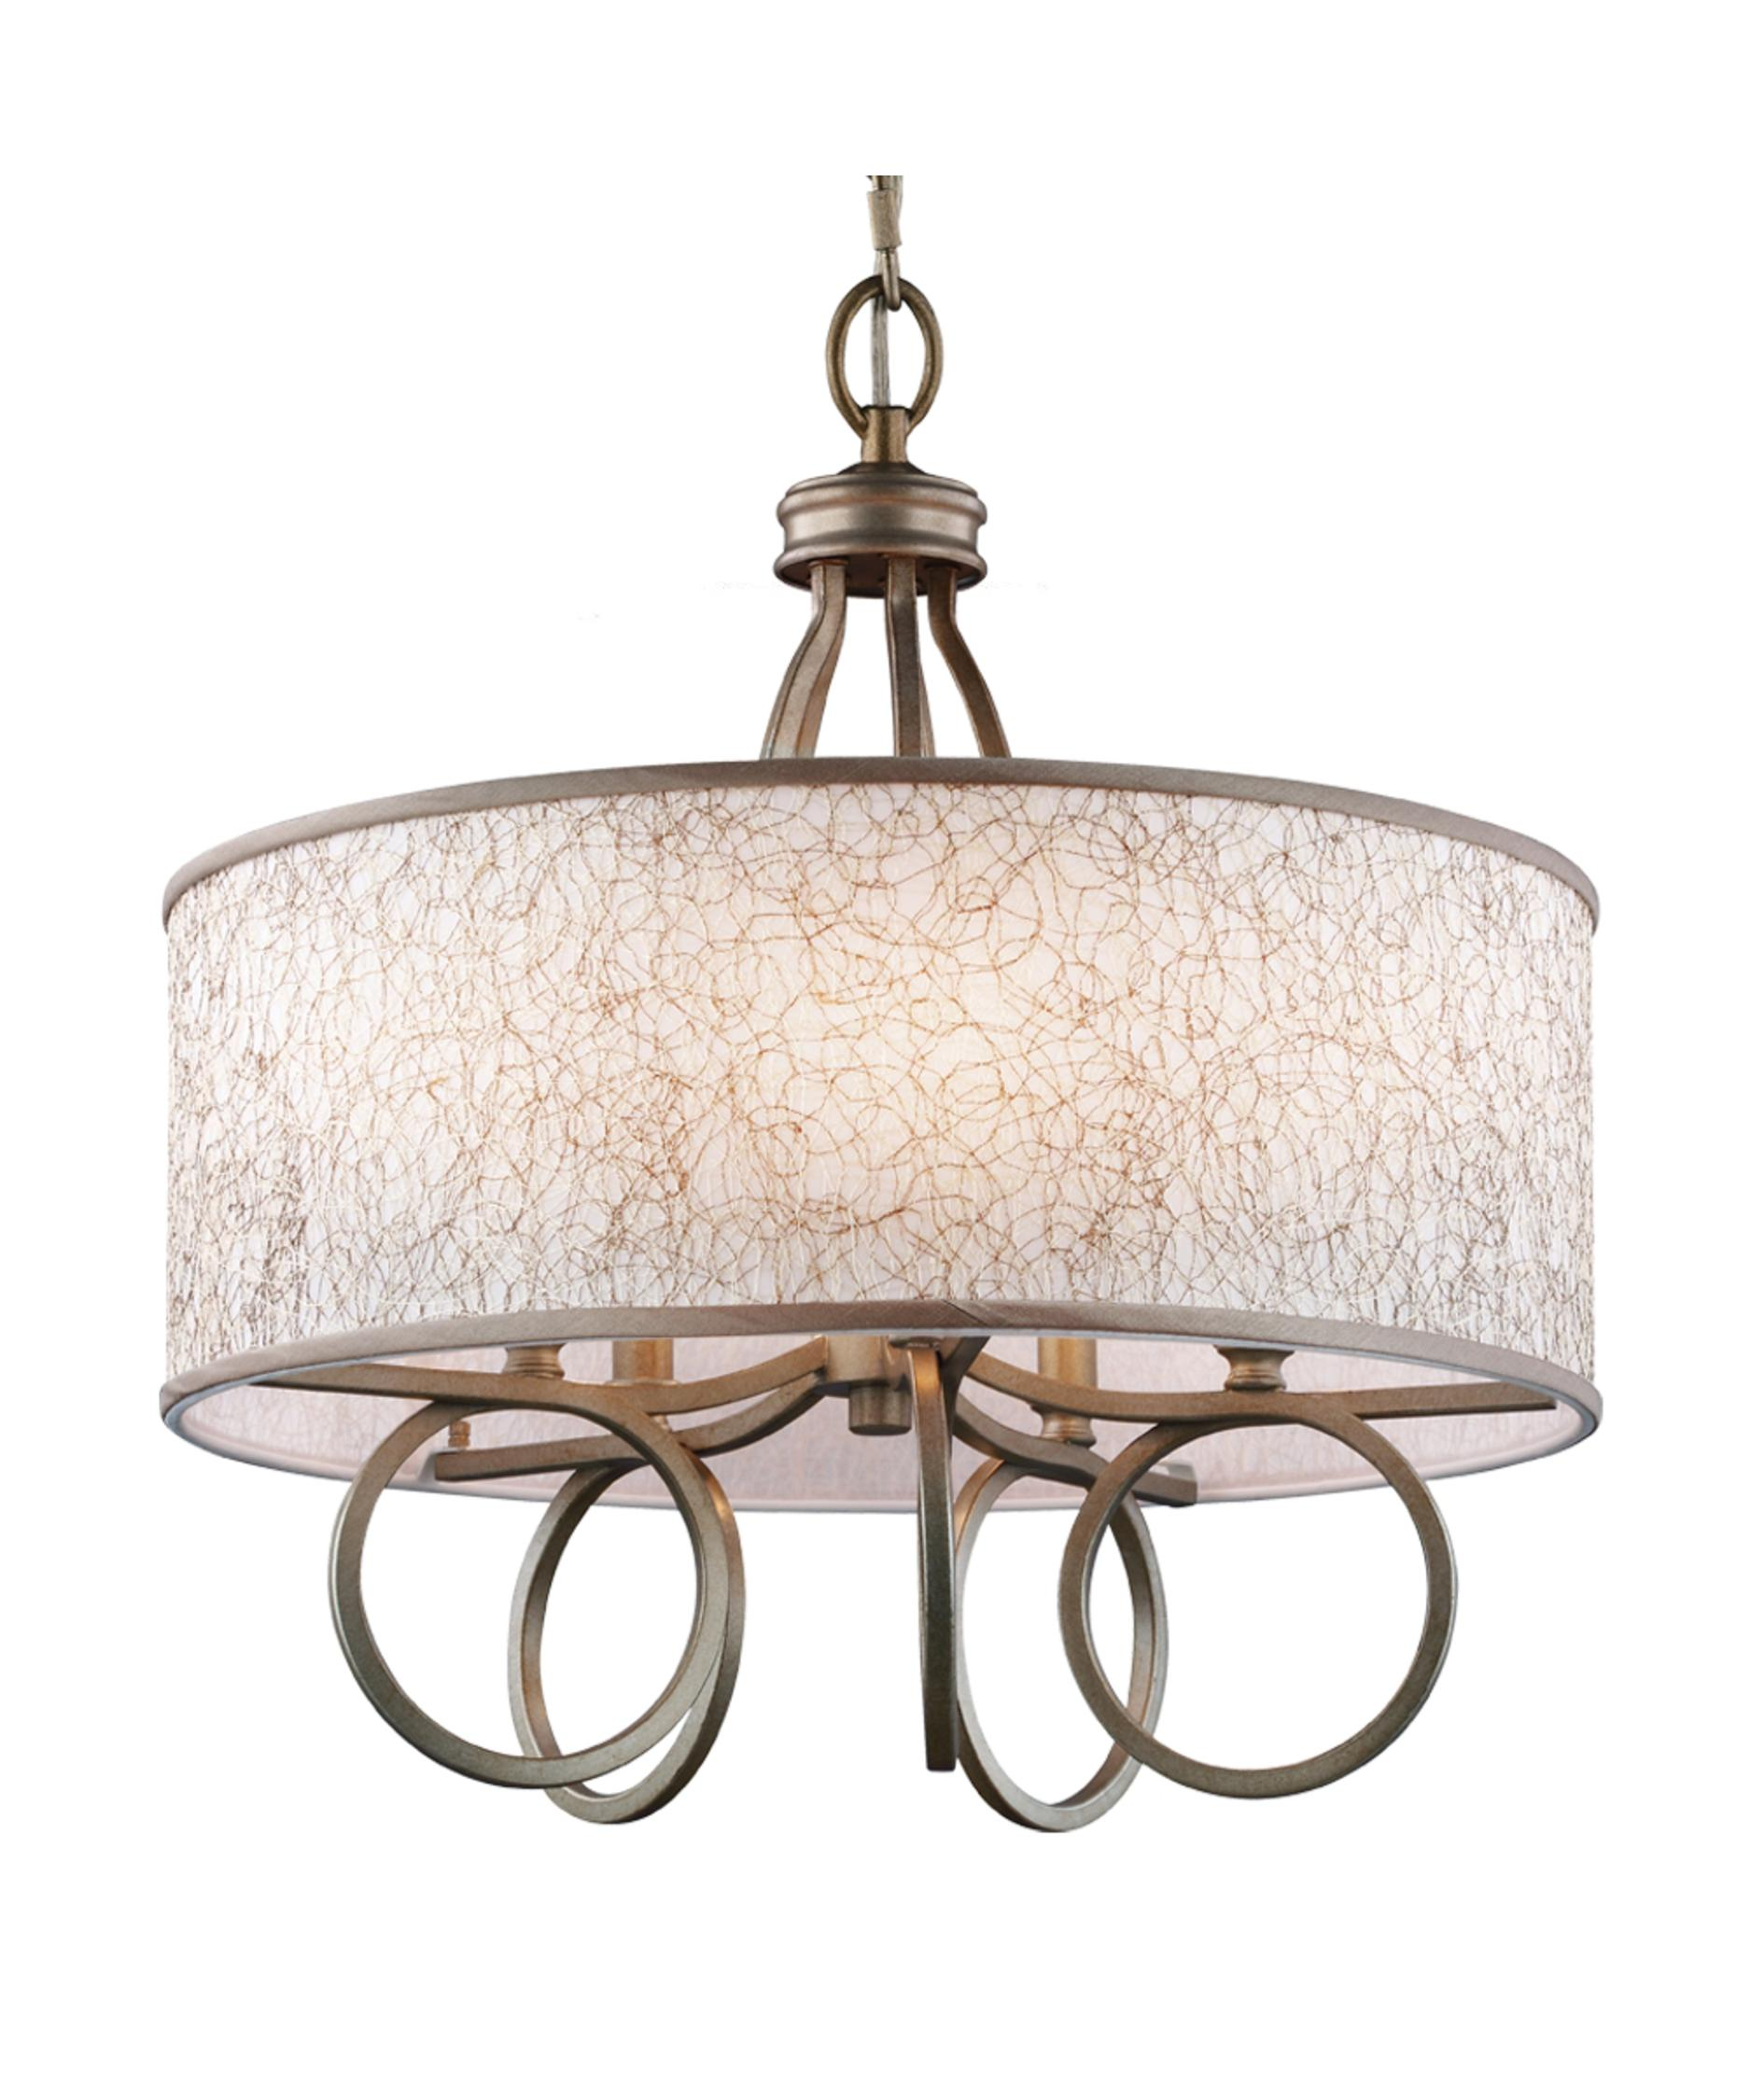 Lamp chandelier wonderful murray feiss lighting for home lighting ornate ceiling fans murray feiss montecarlofans arubaitofo Image collections